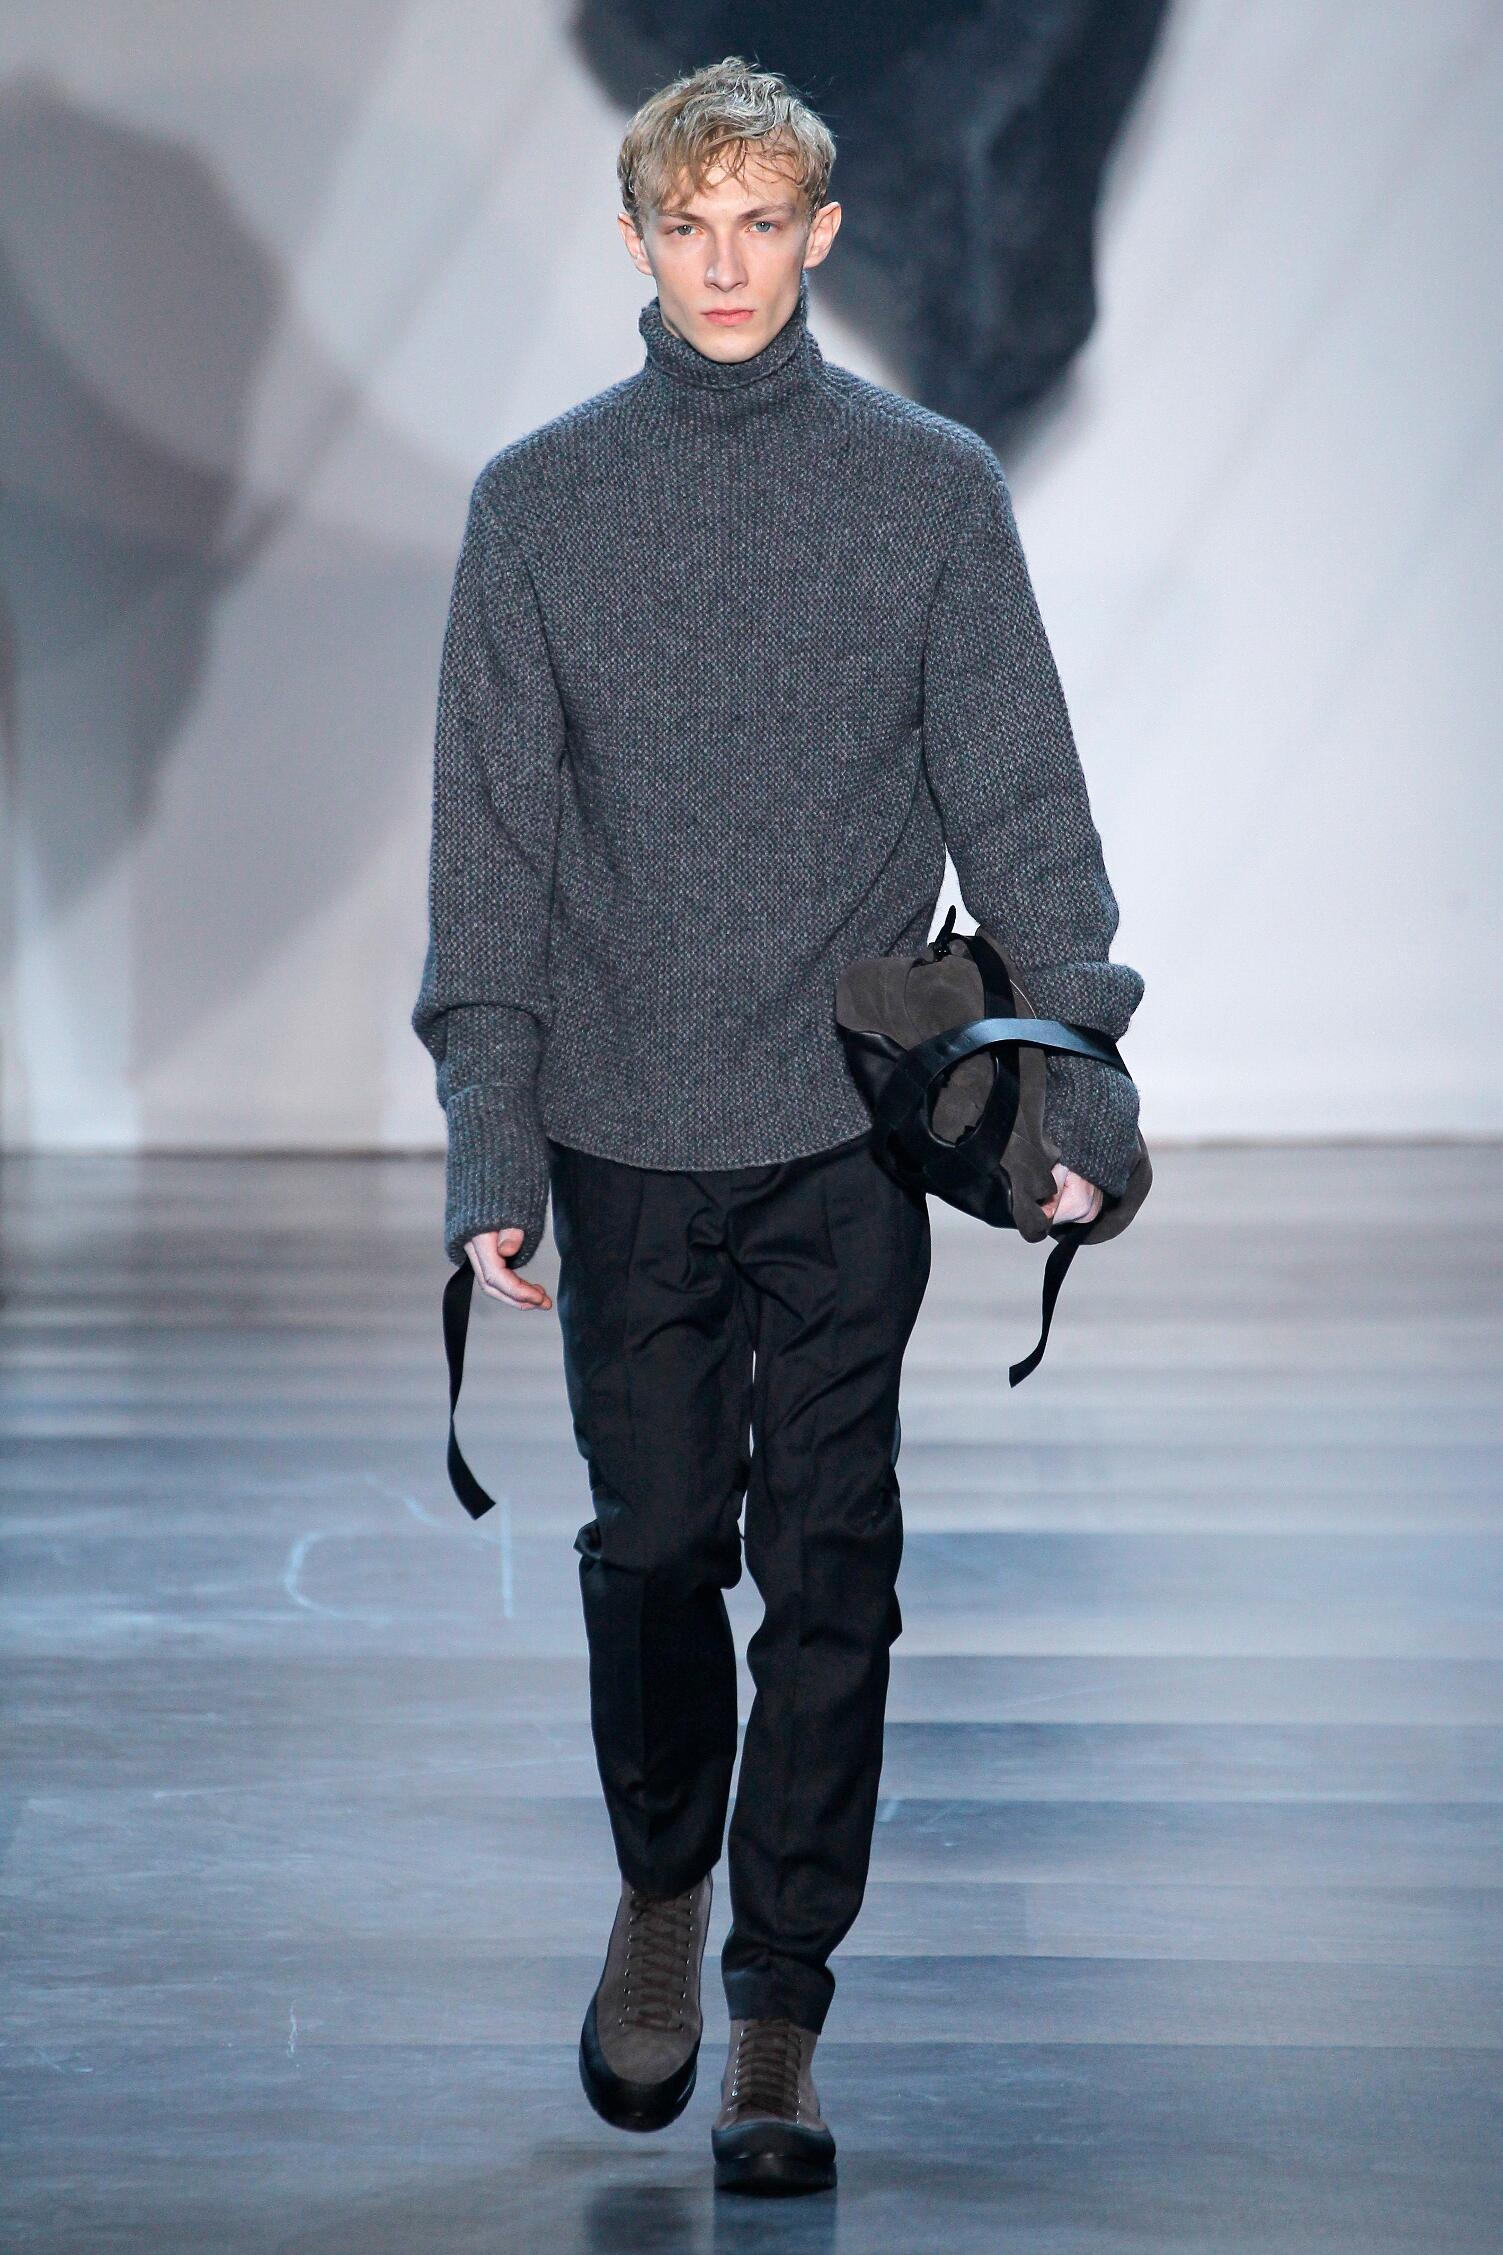 Fashion Man Model 3.1 Phillip Lim Collection Catwalk